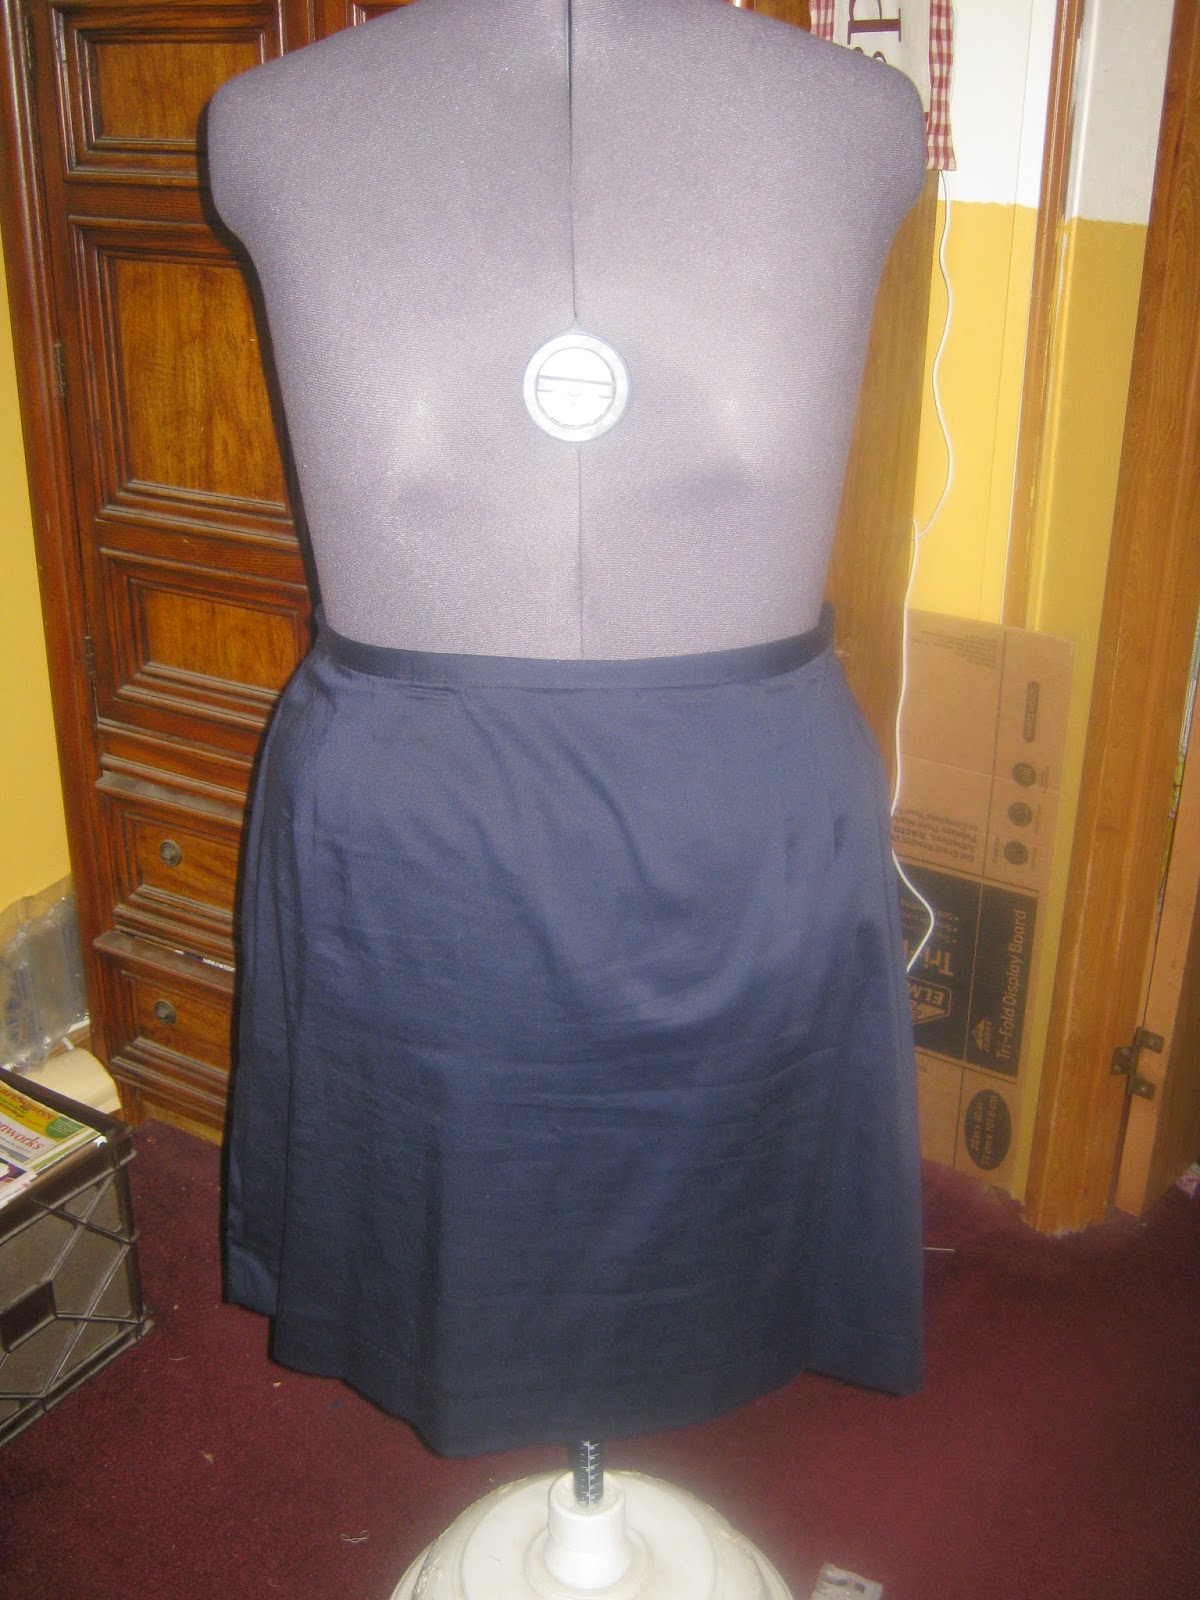 McCall's 3588 Straight Skirt Blue Twill www.sewplus.blogspot.com